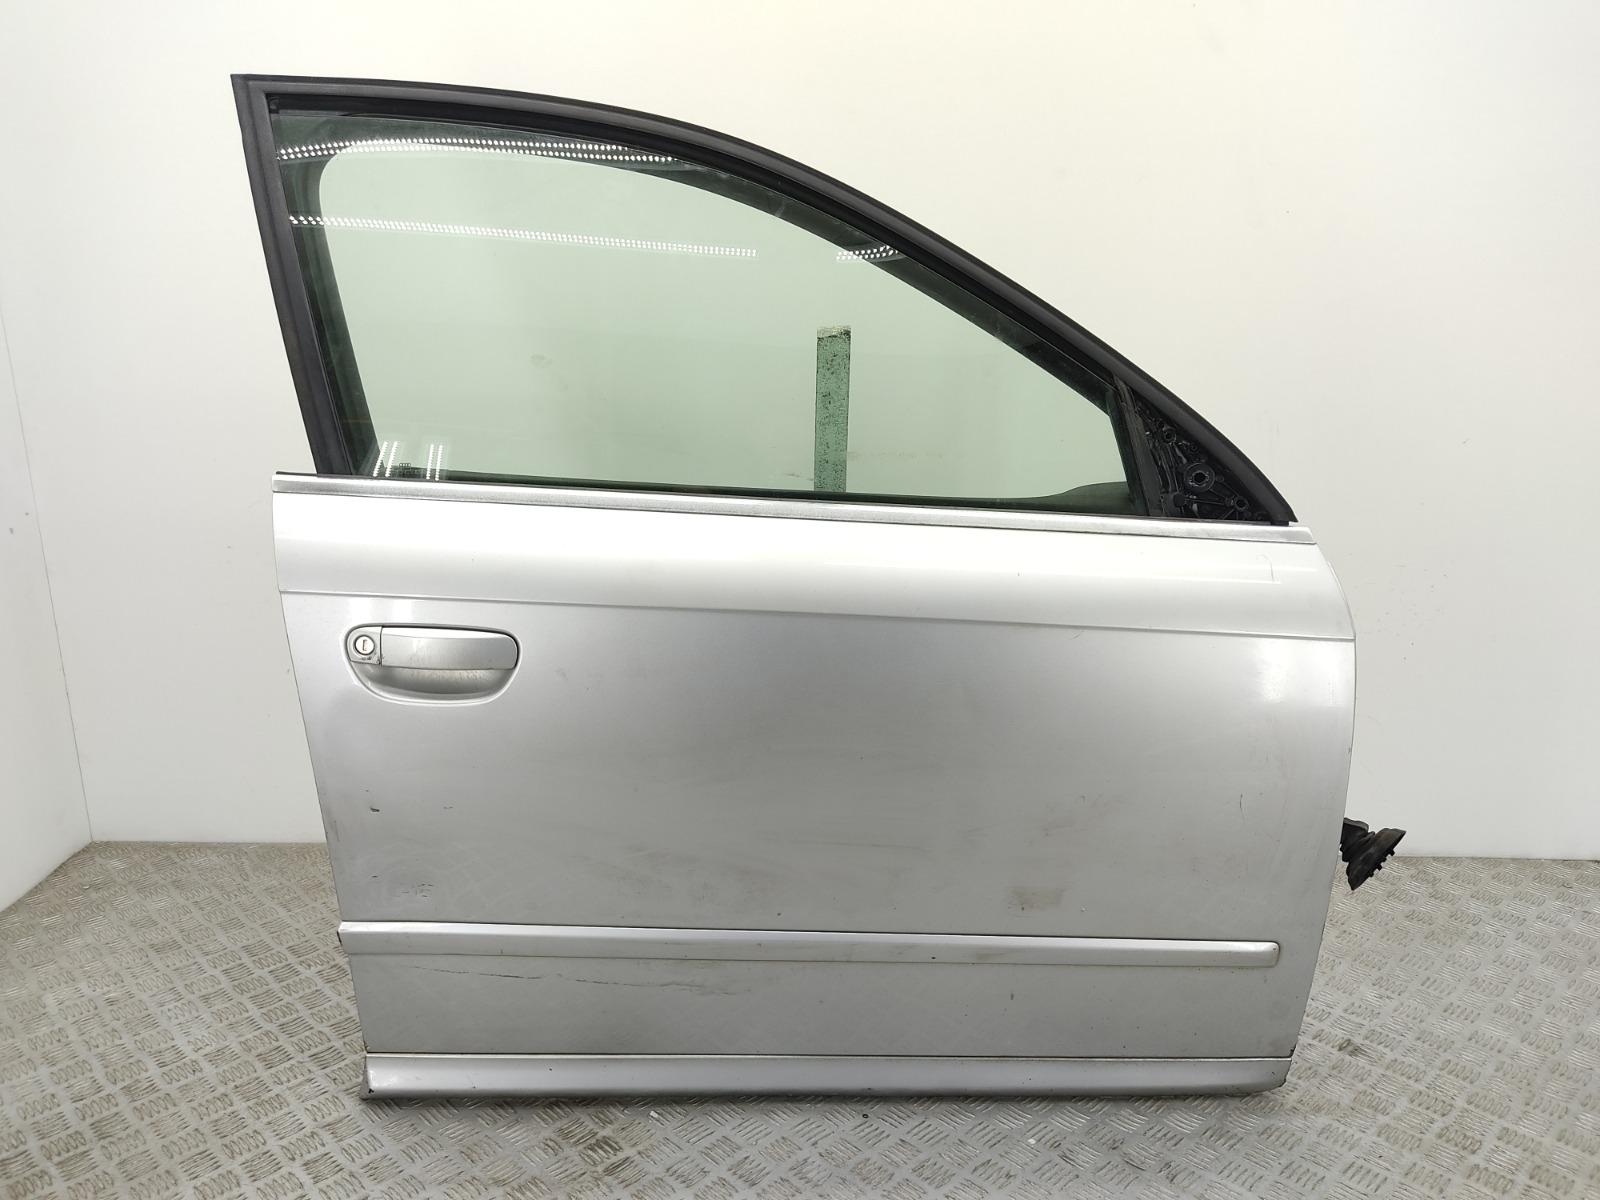 Дверь передняя правая Audi A4 B7 2.0 TDI 2006 (б/у)